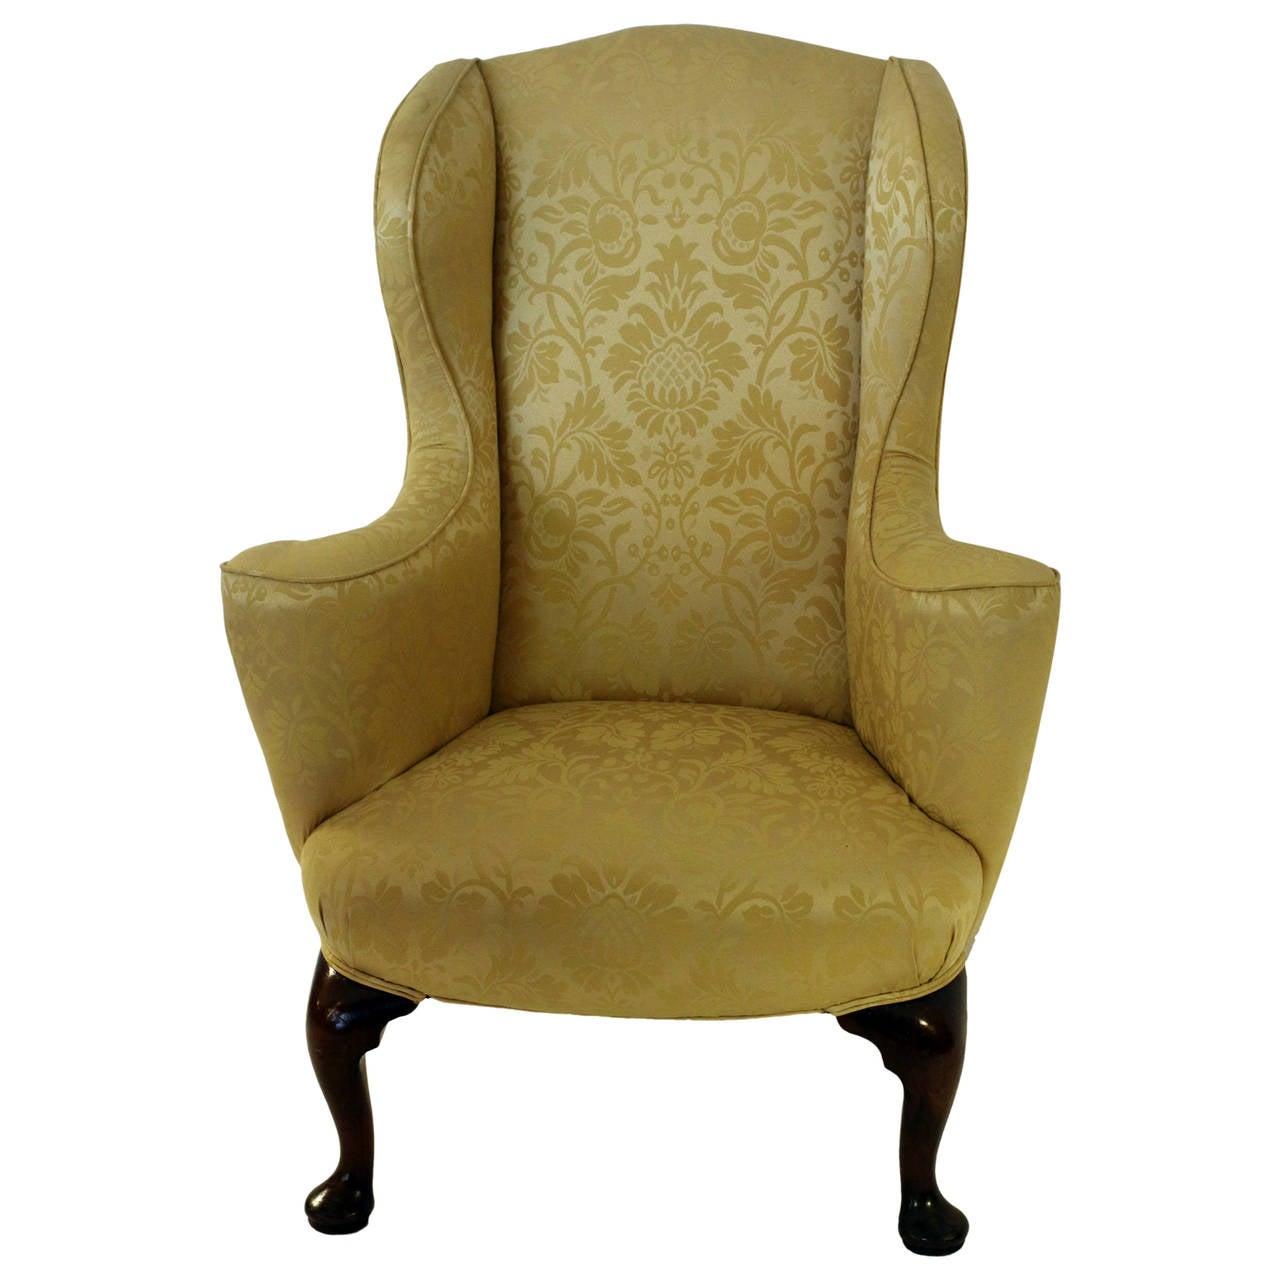 18th Century English Georgian Wingback Chair